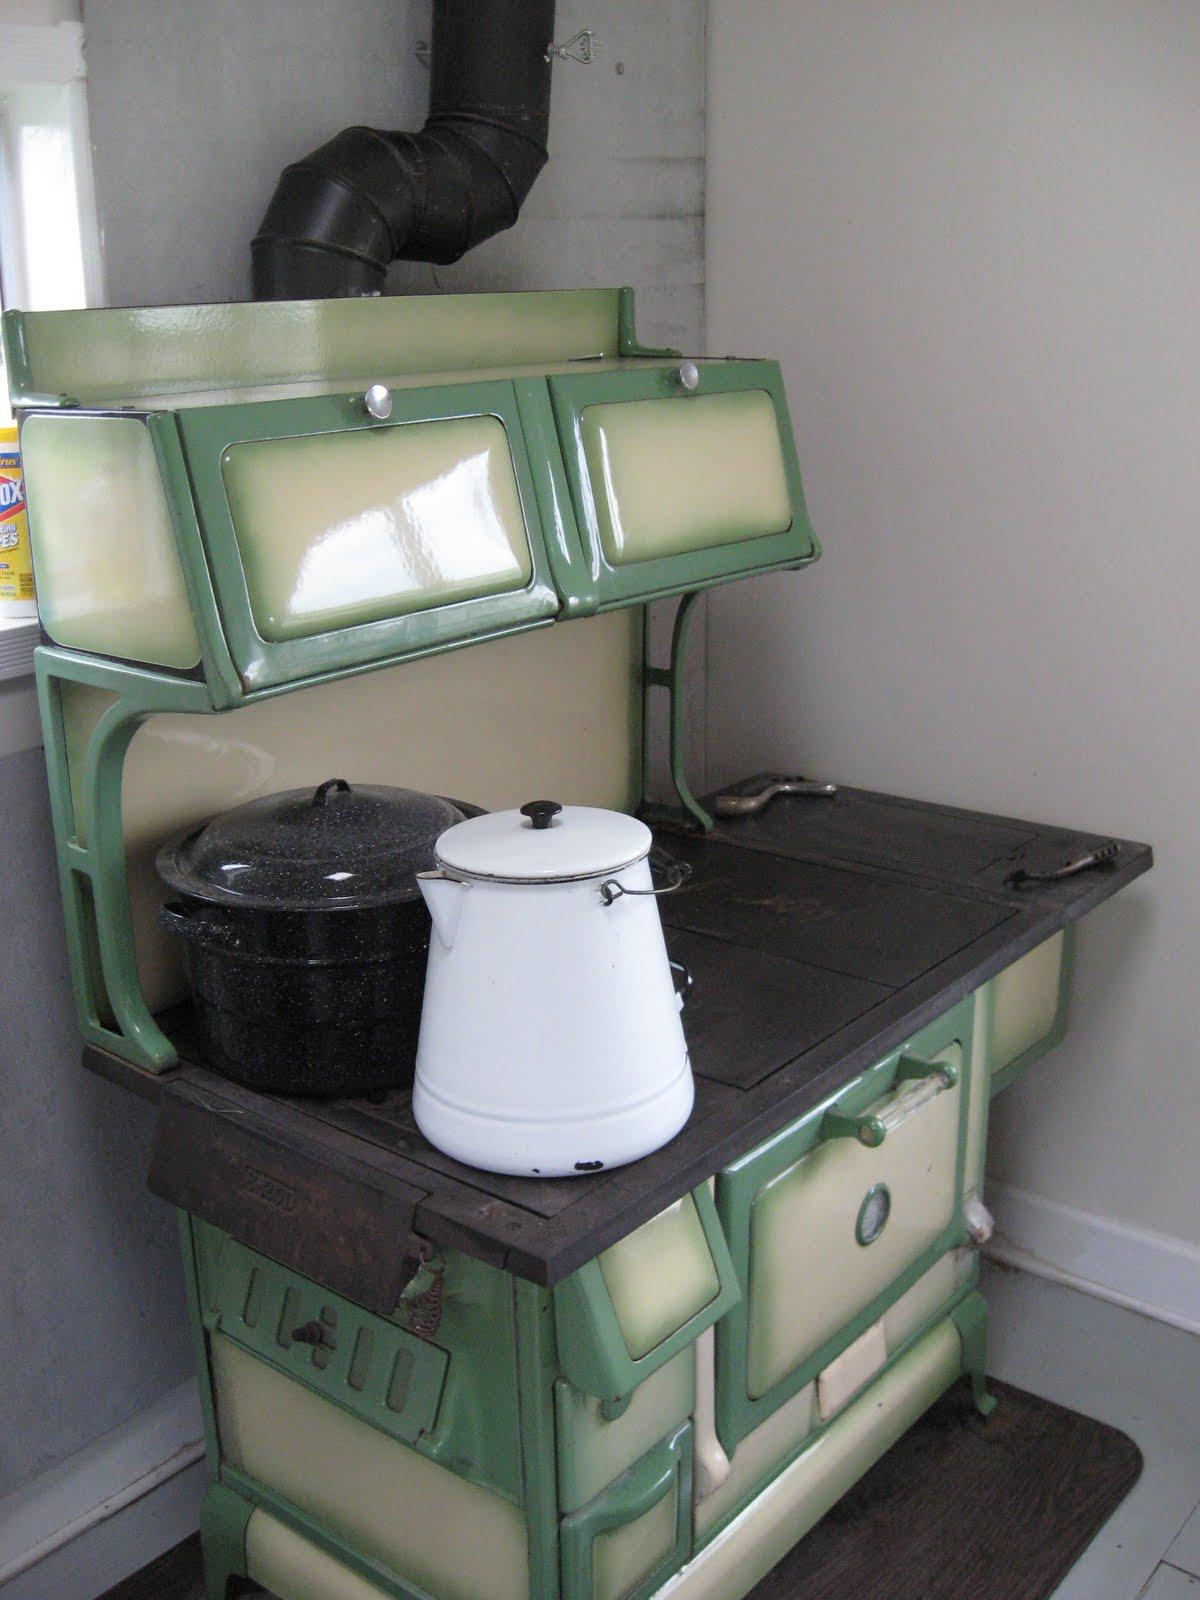 Ixl wood stoves Gumtree Australia Free Local Classifieds